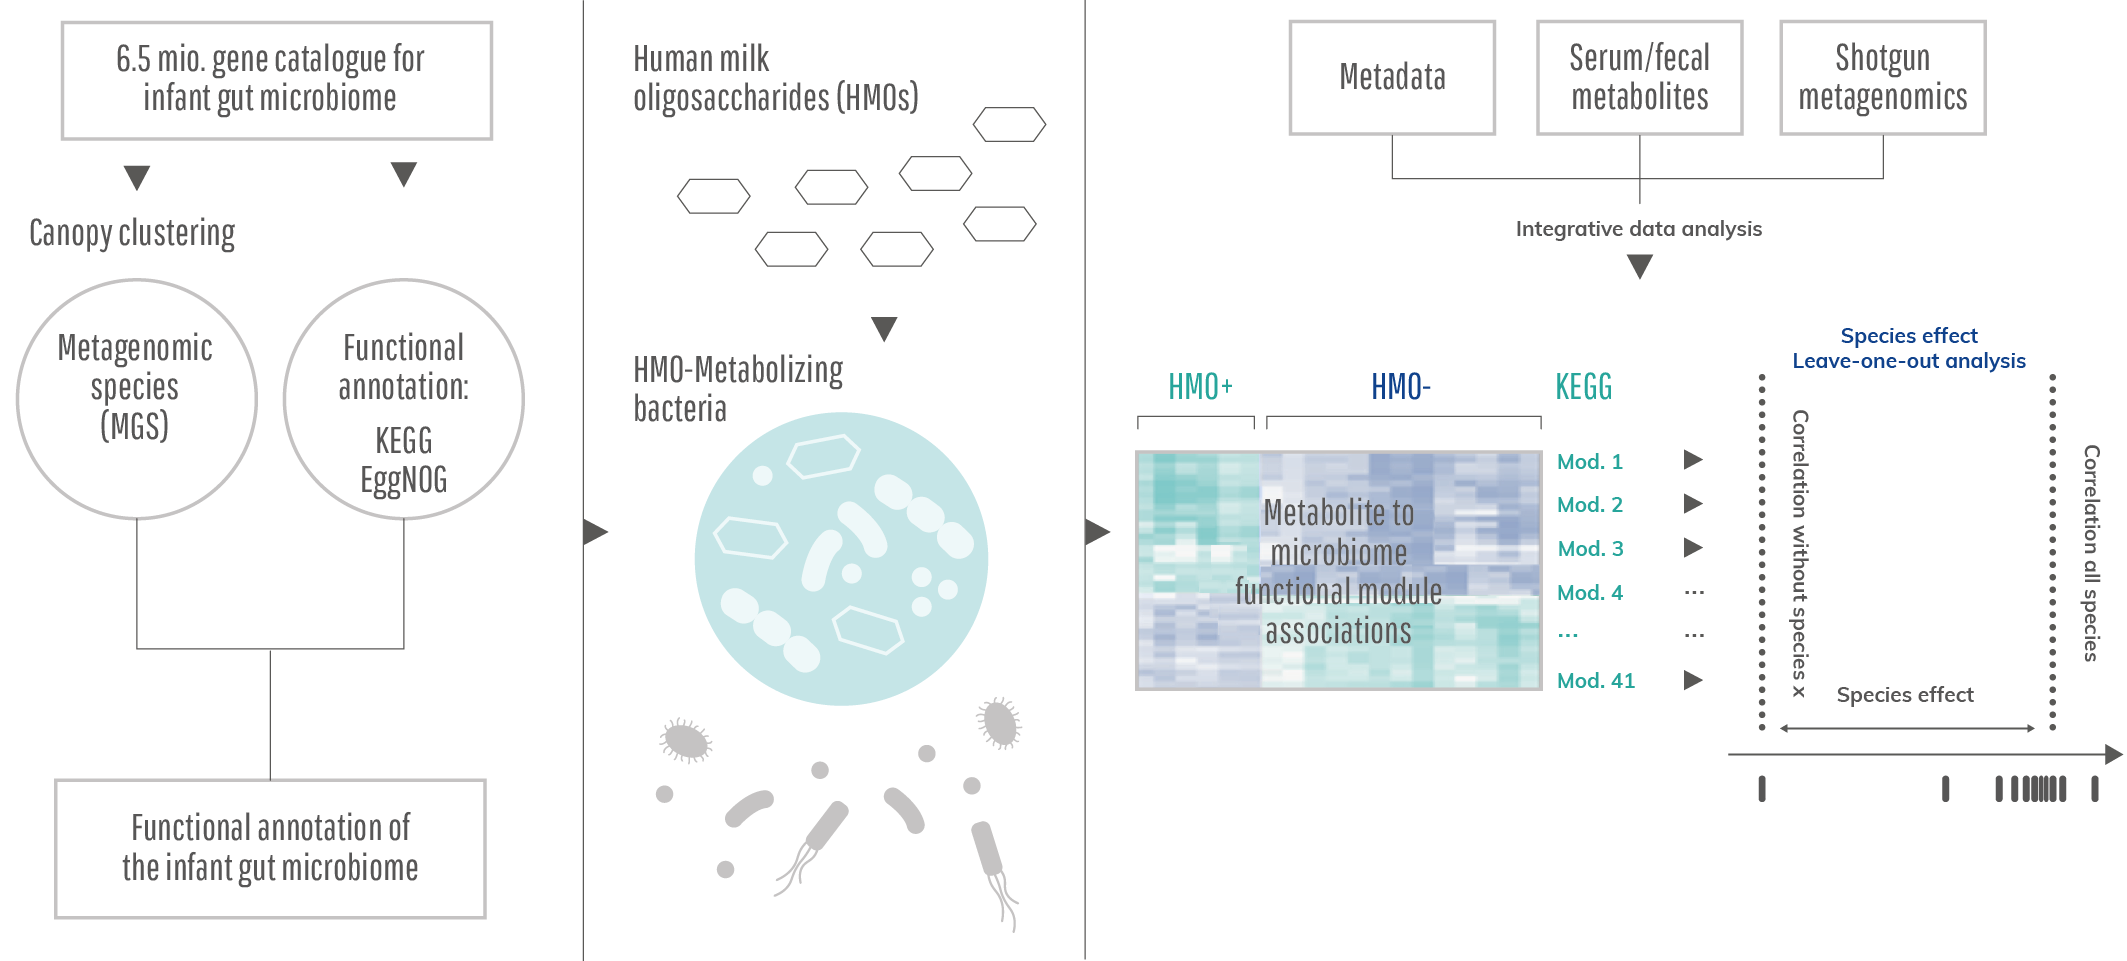 CLI_312_Infografik_Metagenomics_pipeline